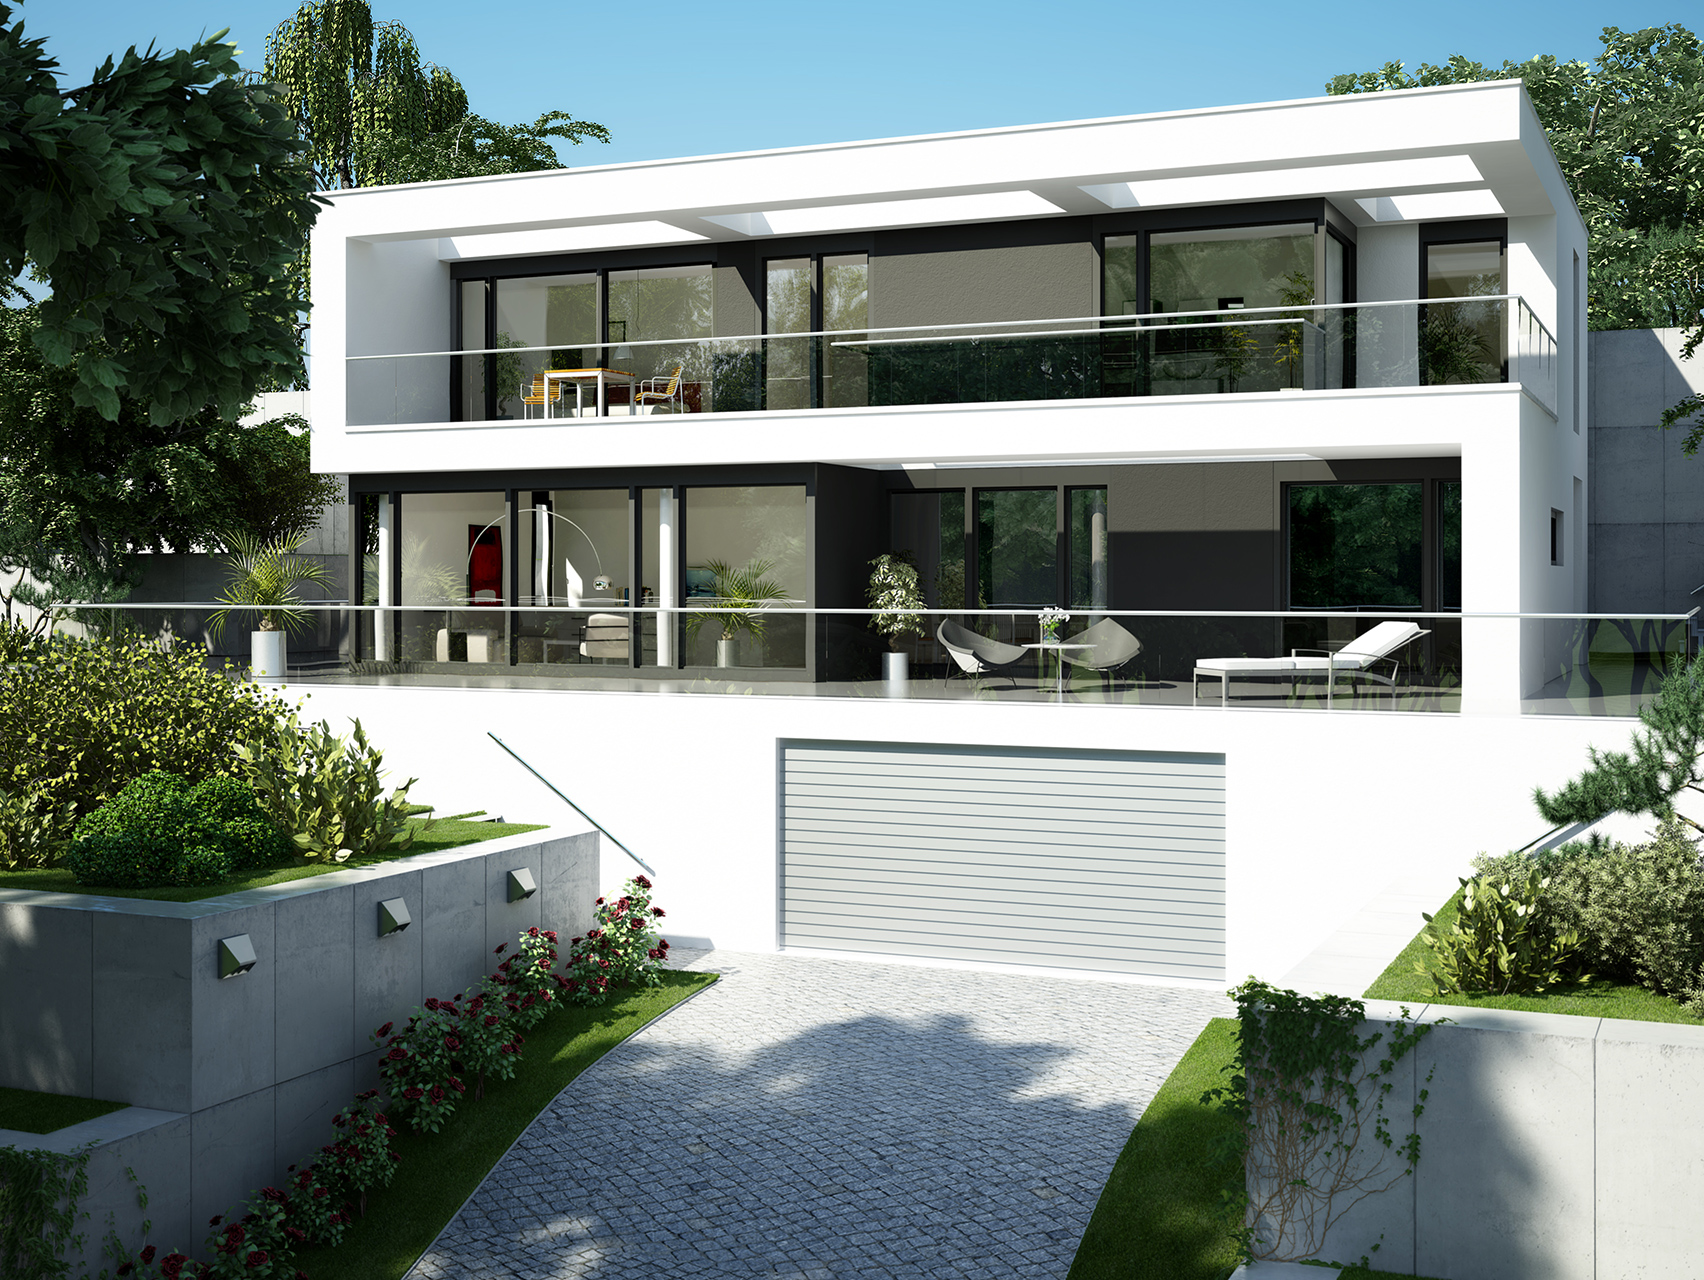 planungsvorschlag villa im bauhausstil. Black Bedroom Furniture Sets. Home Design Ideas